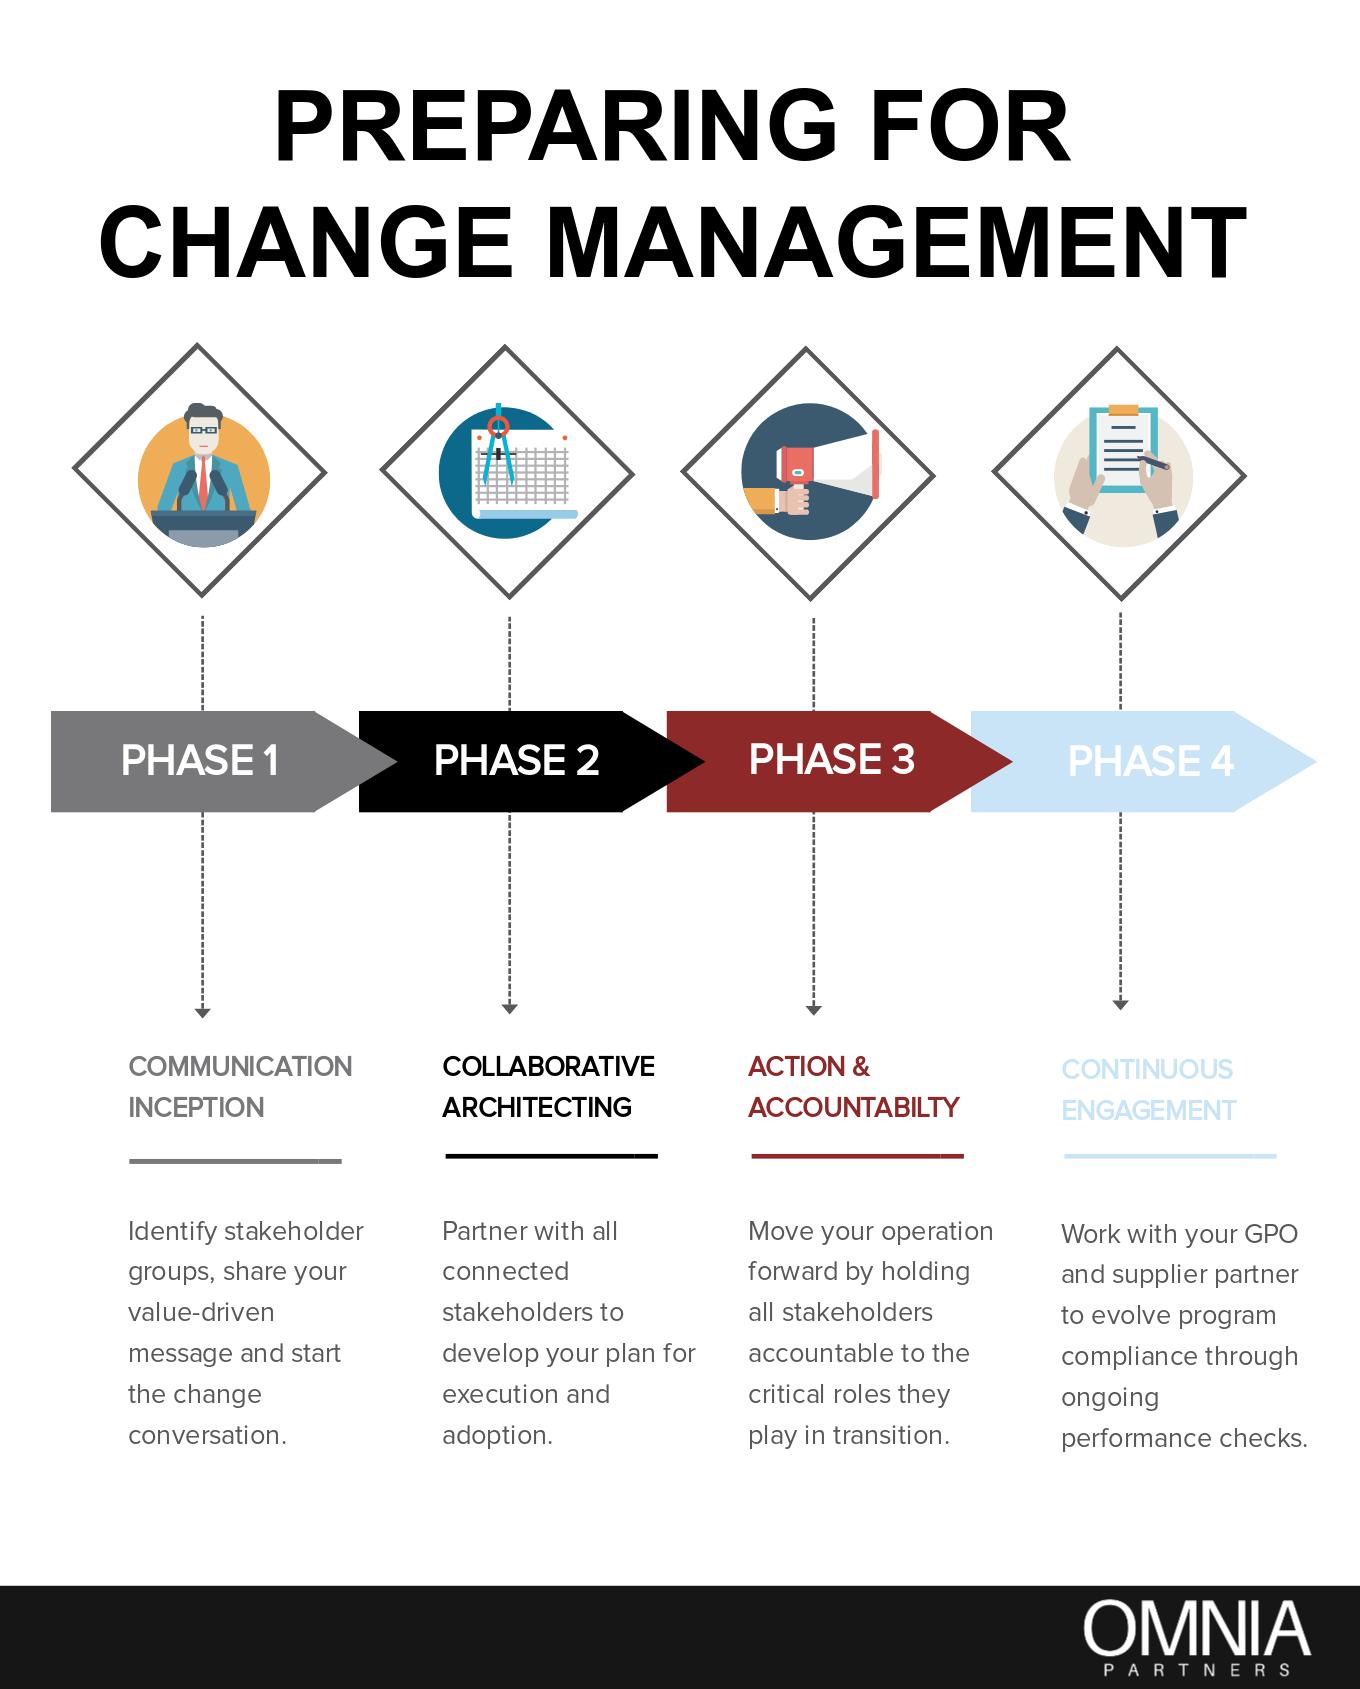 Preparing for Change Management Infographic